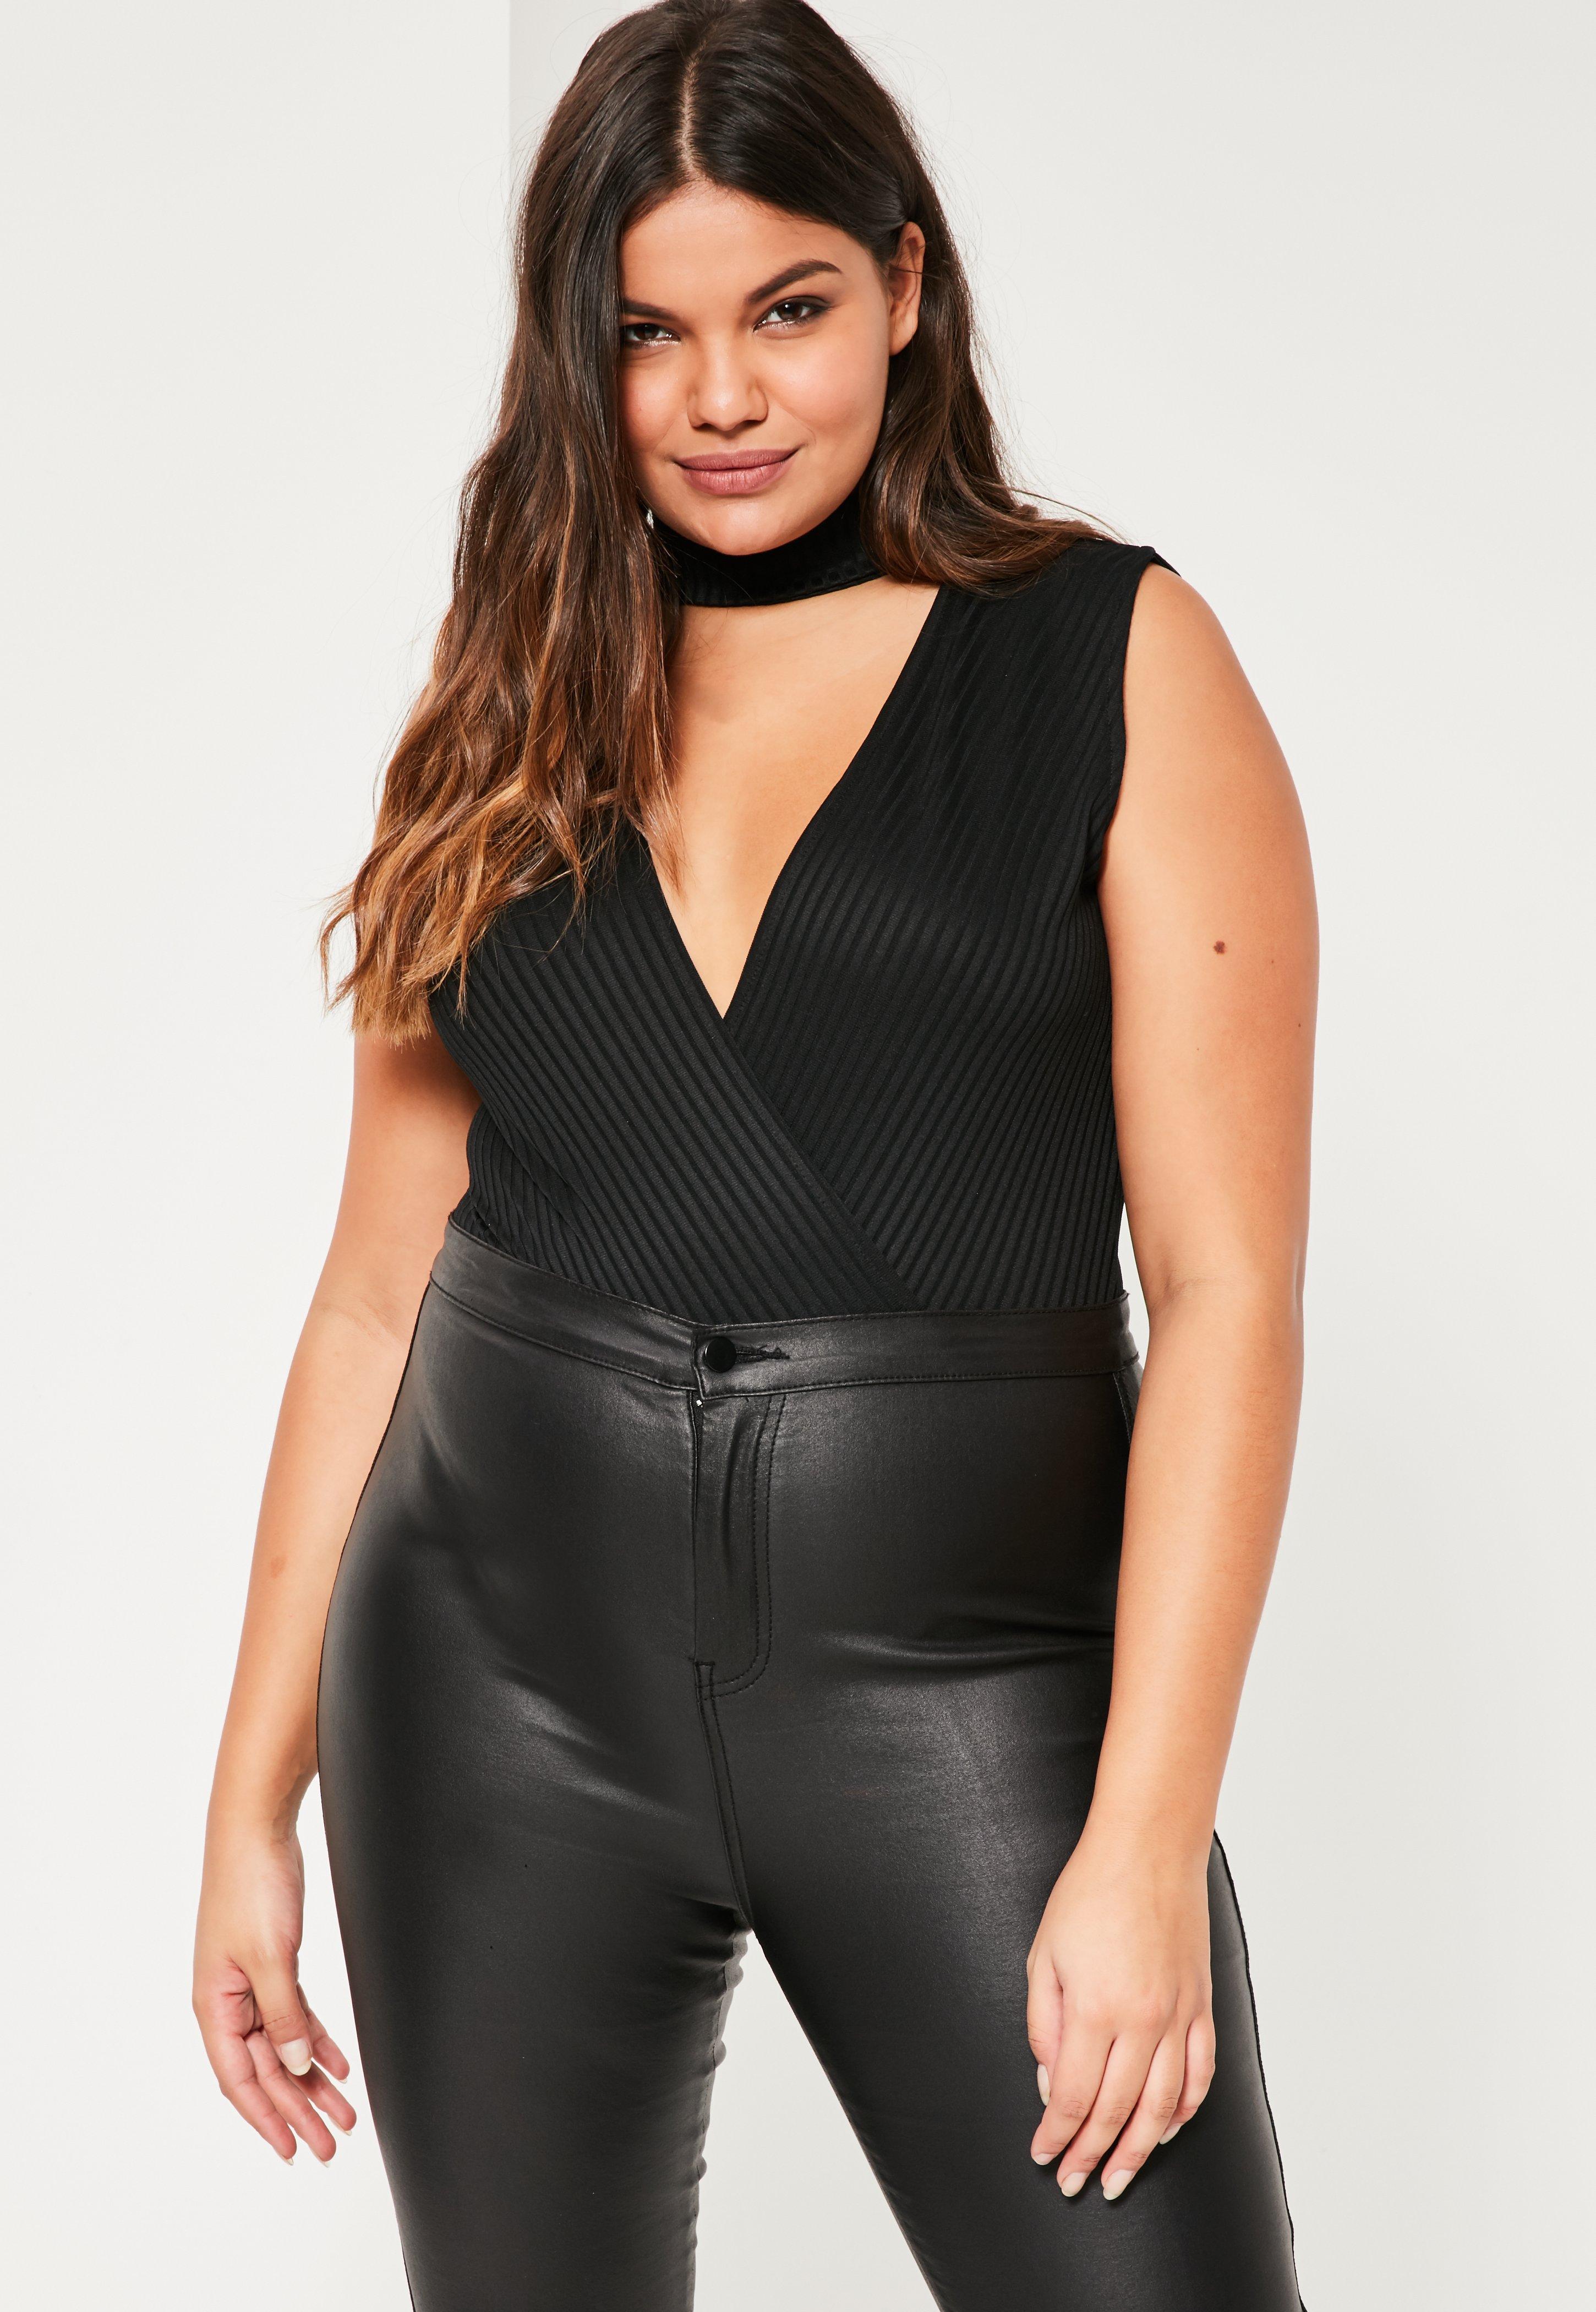 Plus Size Clothing Plus Size Womens Fashion Missguided